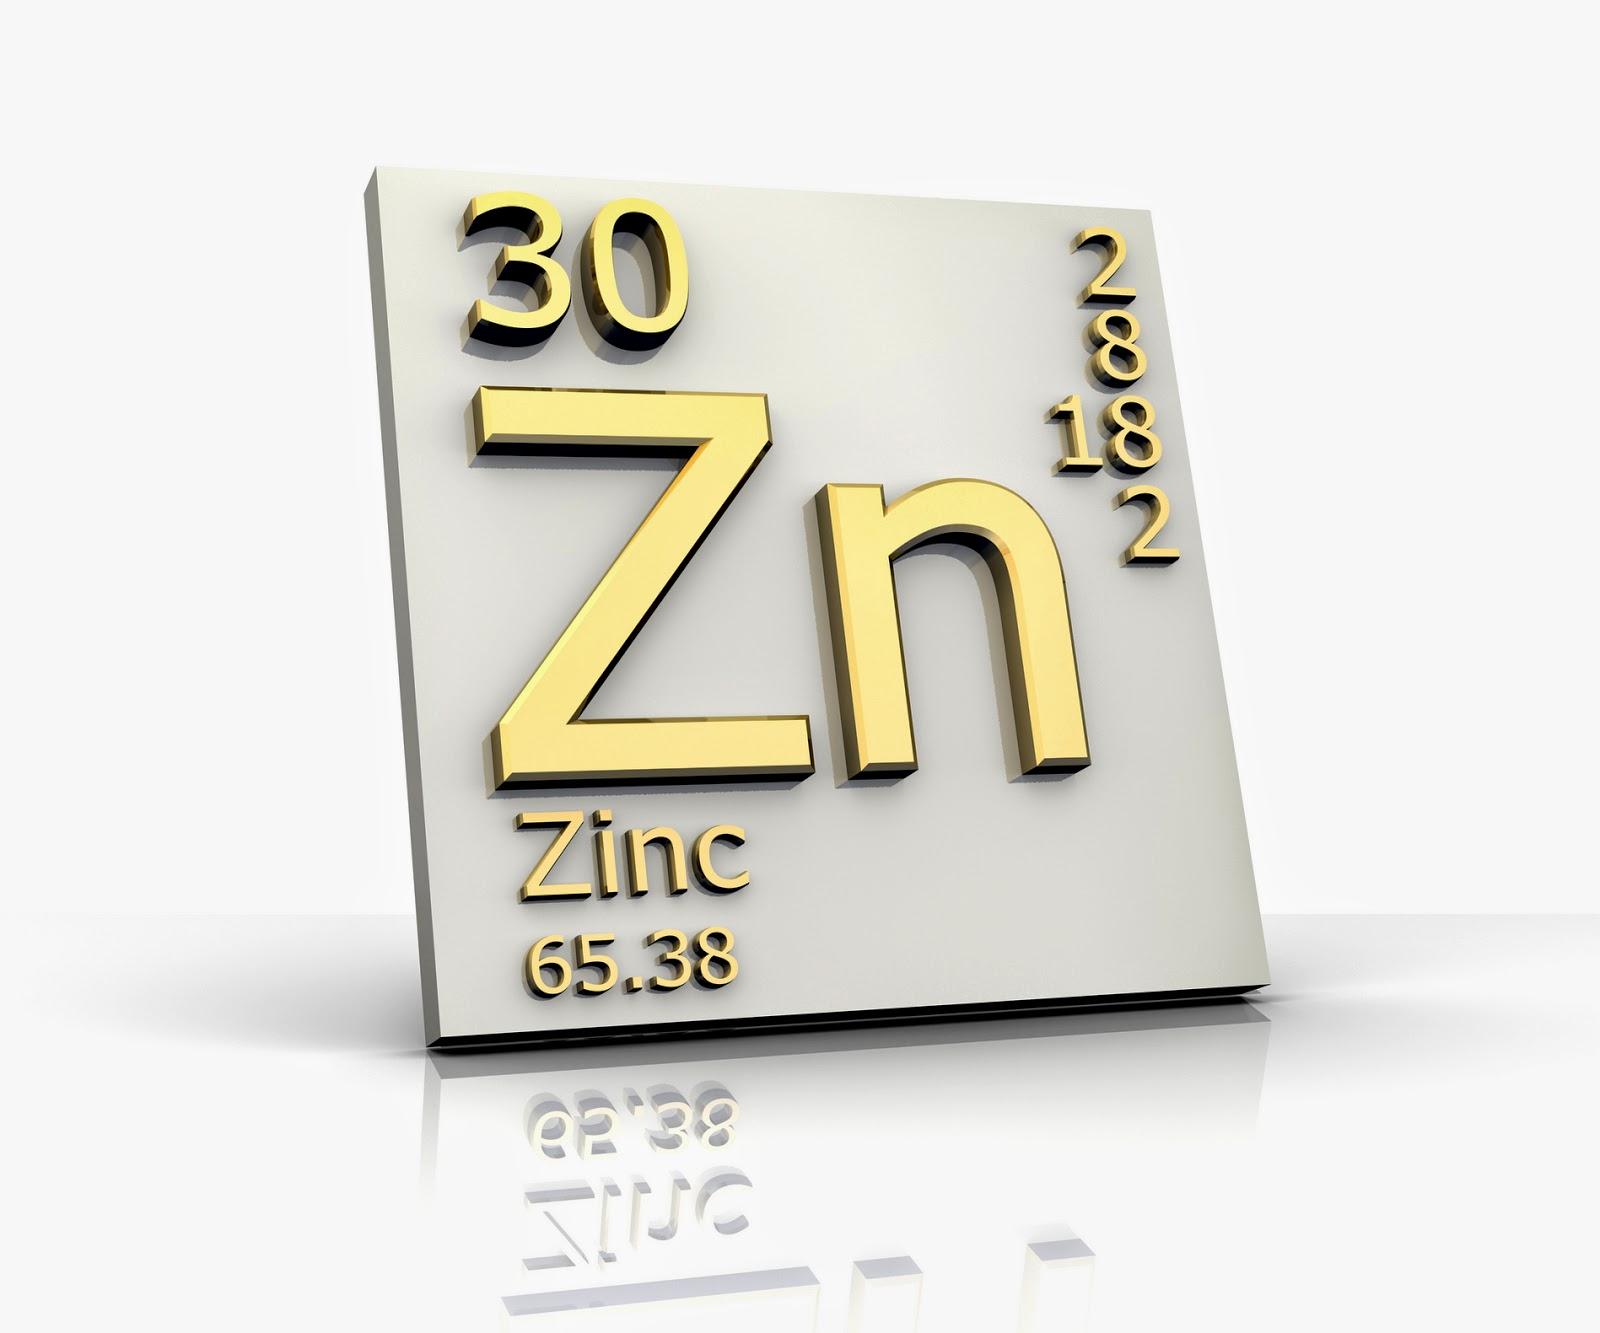 Zinc news